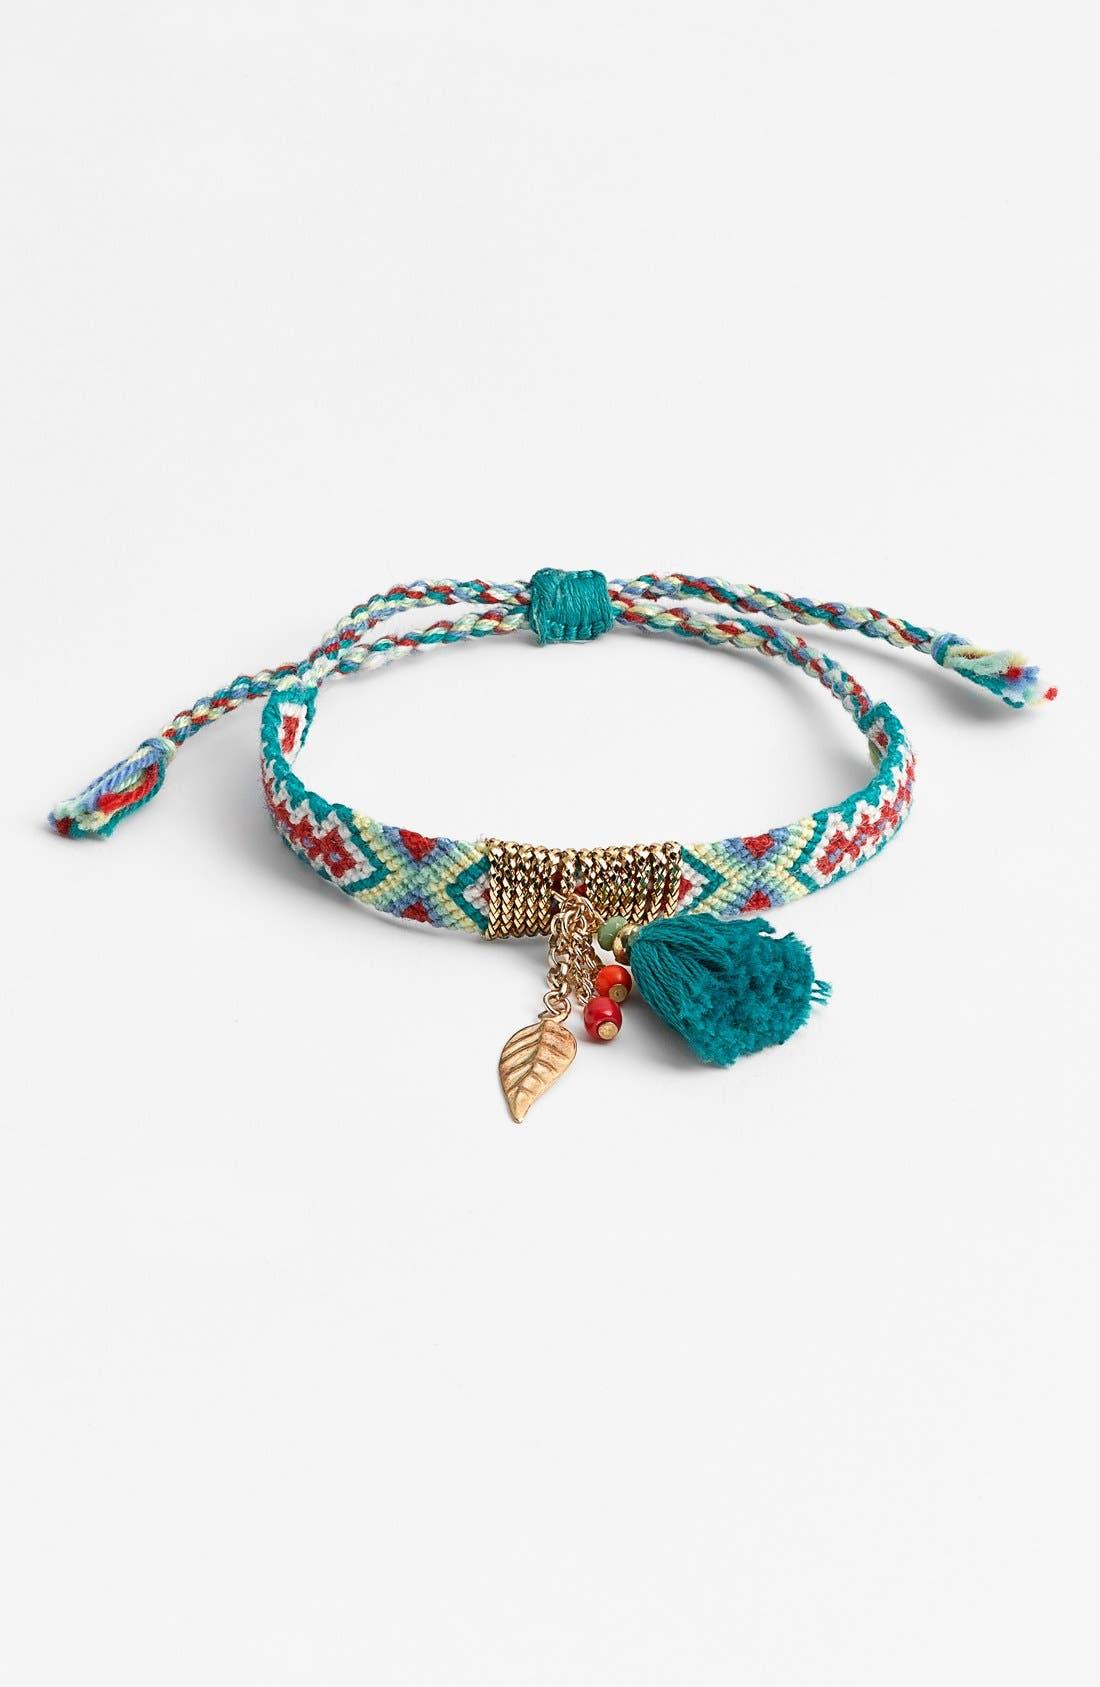 CARA Tassel Woven Friendship Bracelet, Main, color, 300